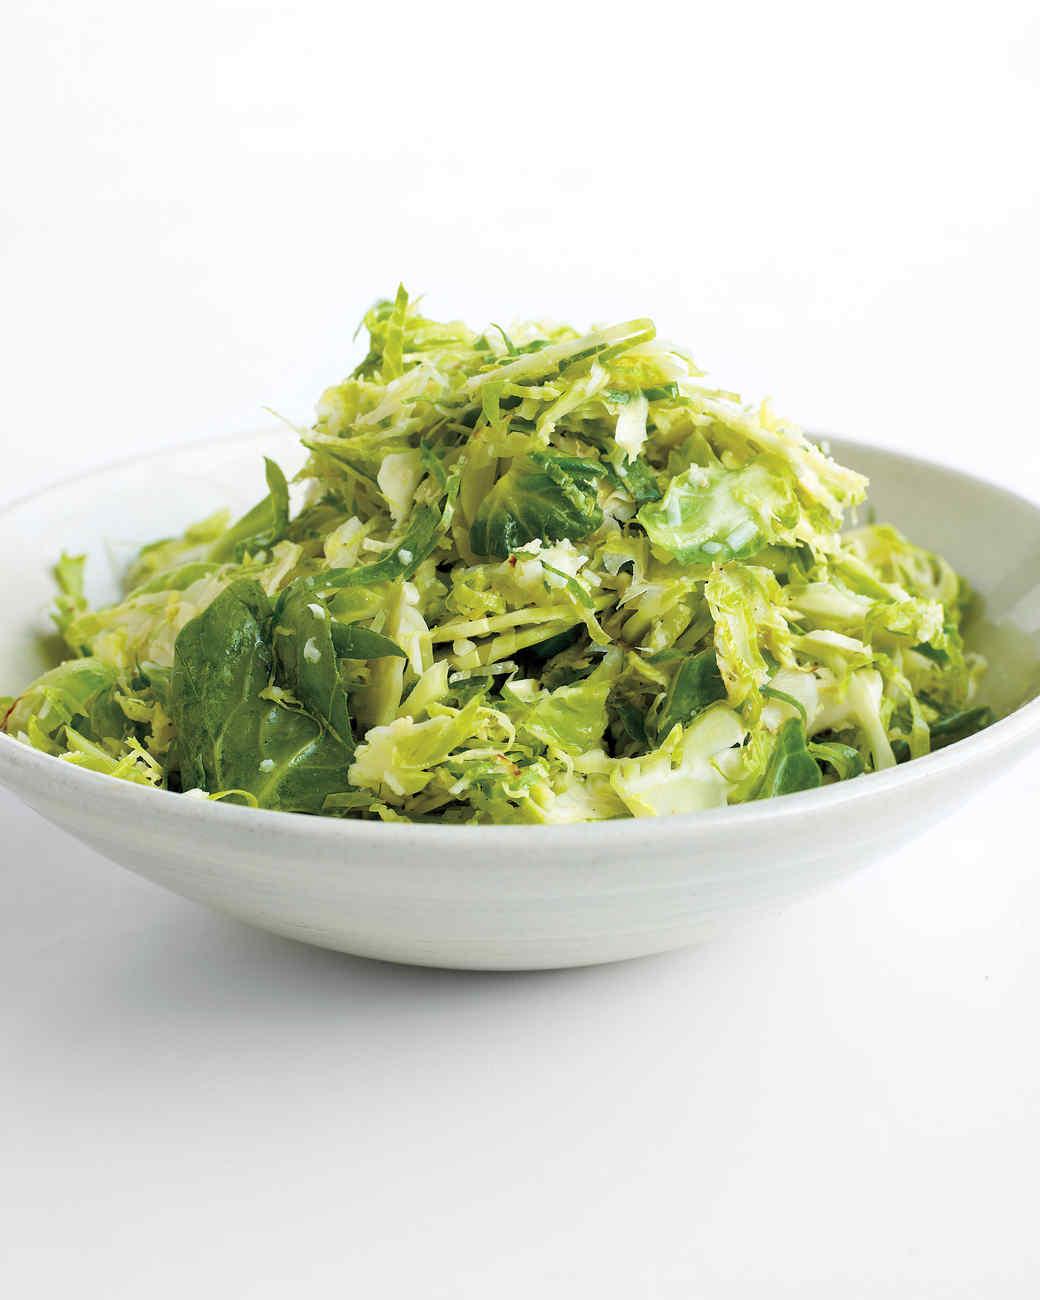 Warm brussels sprout salad recipe martha stewart for Shredded brussel sprout salad recipe